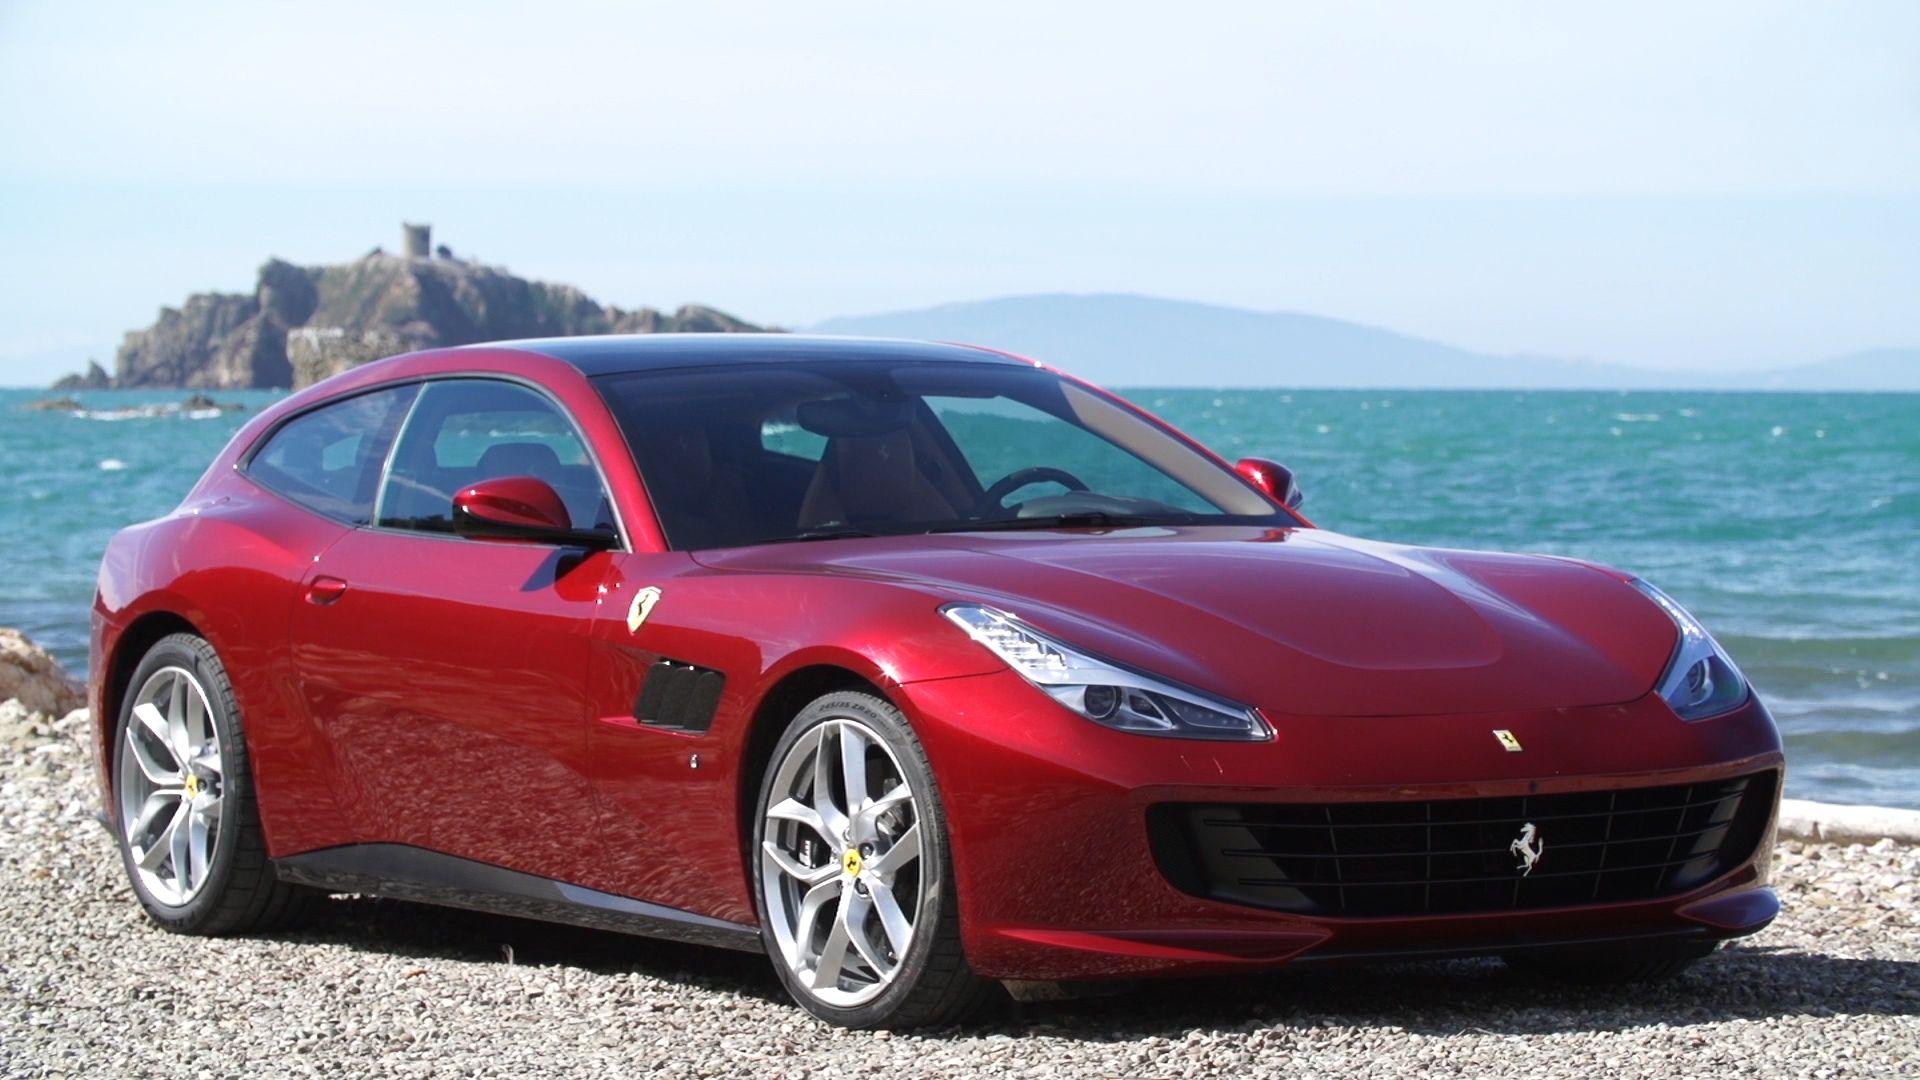 Ferrari GTC4Lusso T review: the best car Ferrari makes? #newferrari